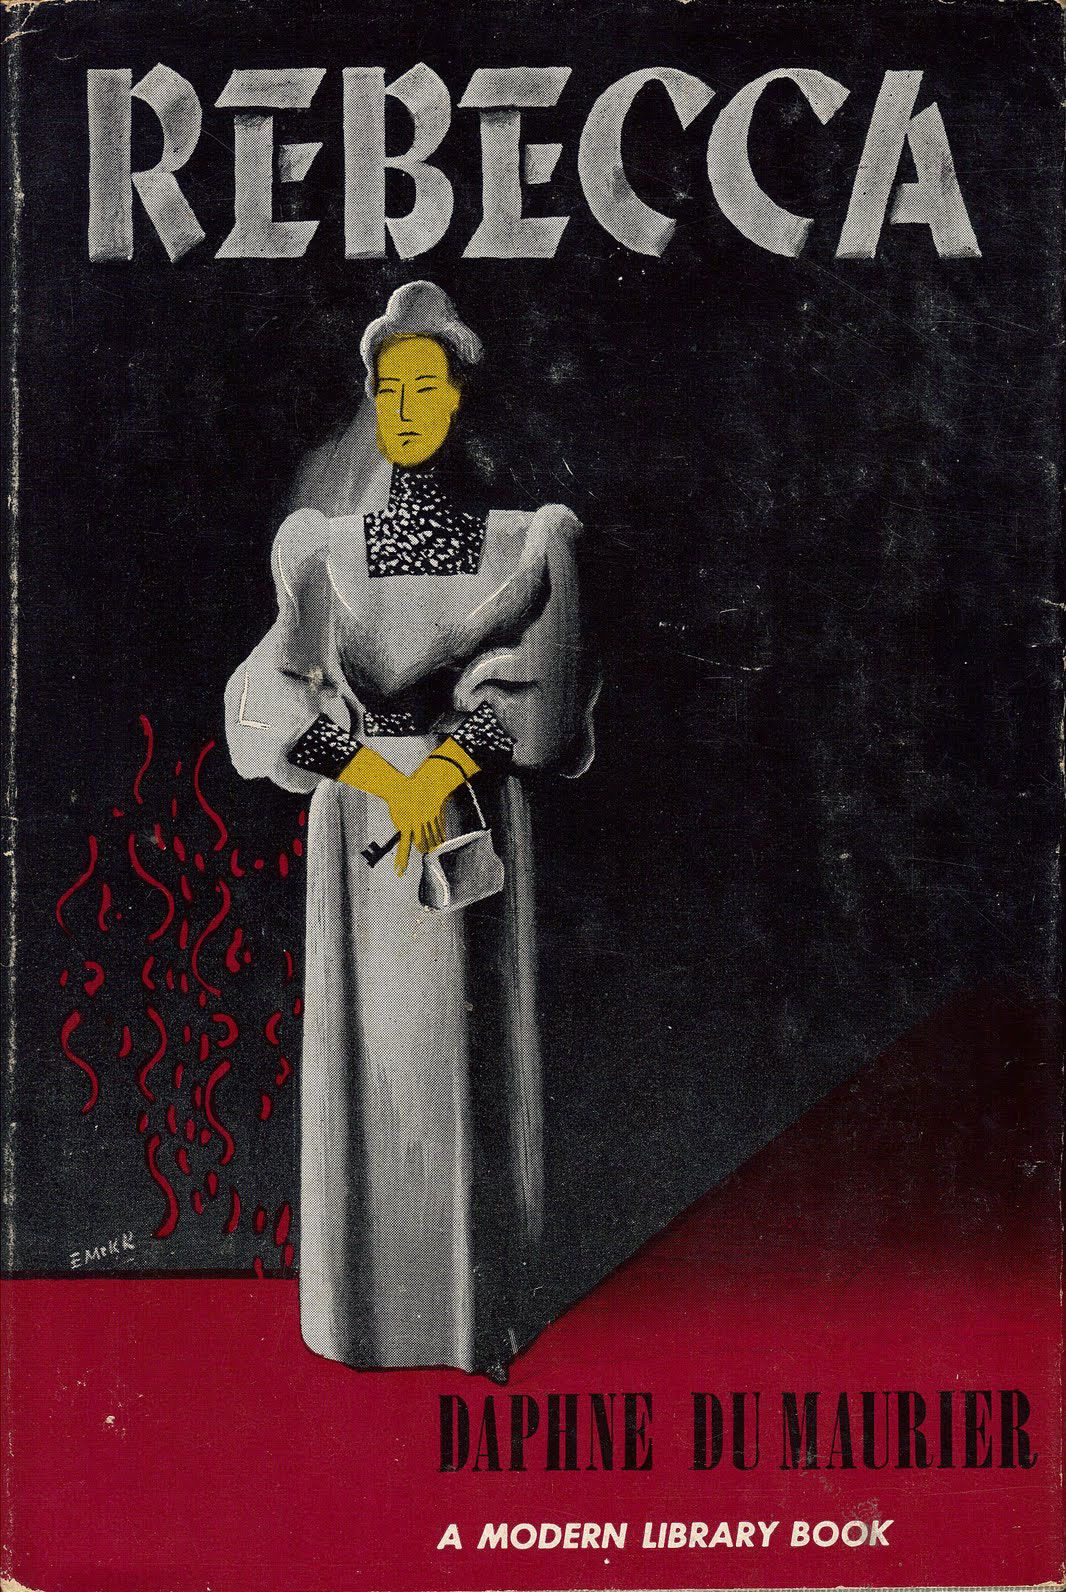 Edward-McKnight-Kauffer-couvertures-livre-rebecca